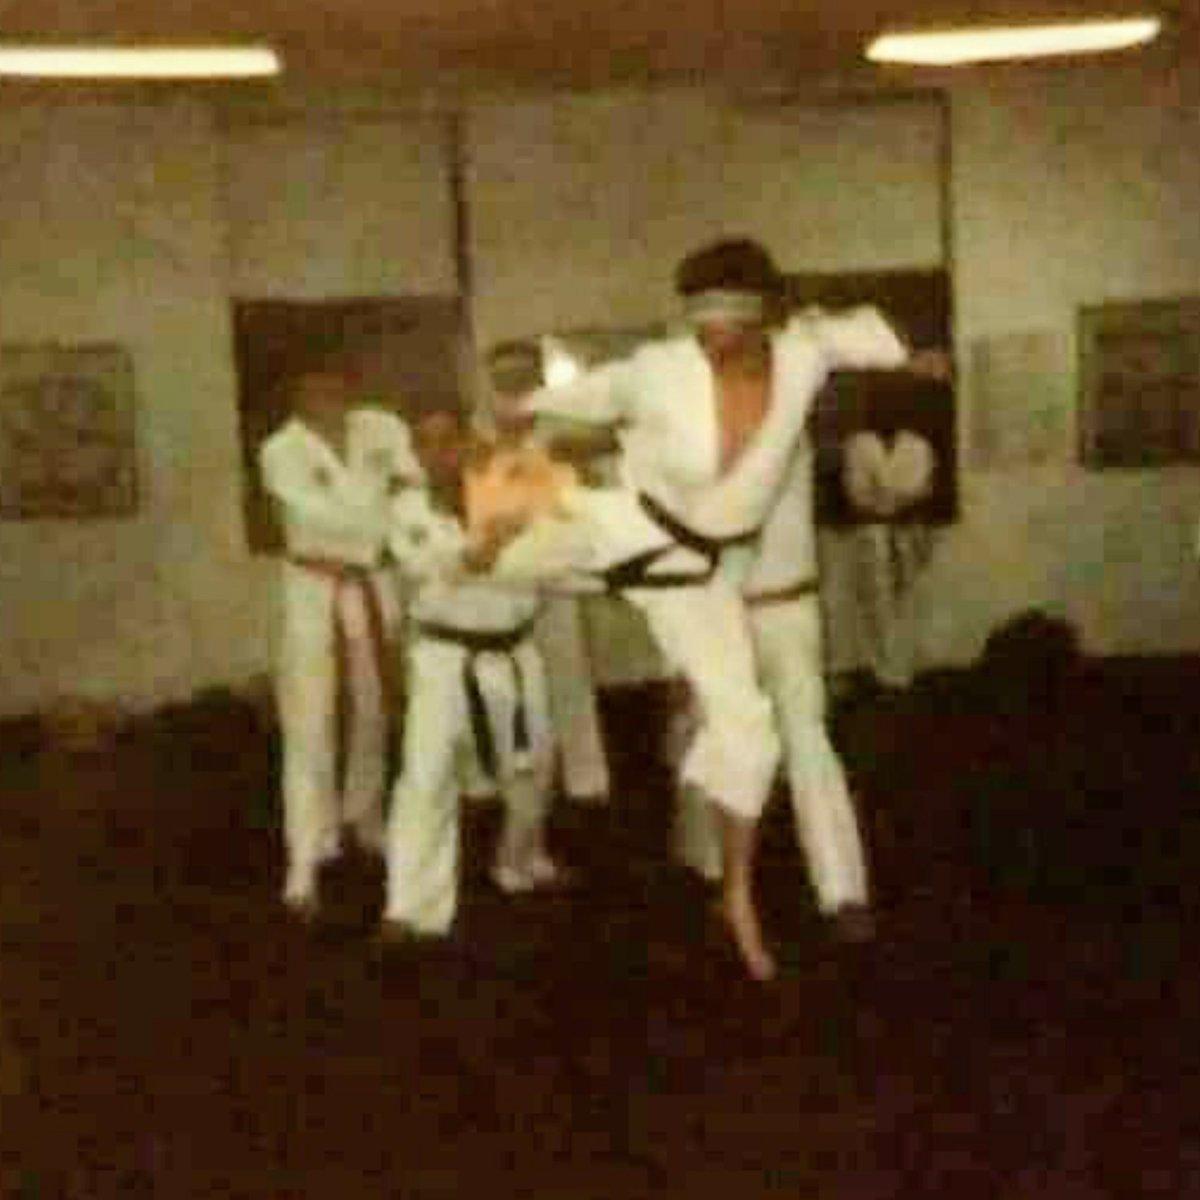 Promotion test doing a Blind Jumping Spinning Back Kick for my 1st Degree Black Belt in World Tae Kwon Do Federation under Grandmaster Tiger Kim Bronx, NY #AnthonyTheTigerCruz #TeamRenzoGracie @Twitter https://t.co/LkSqxGFriw